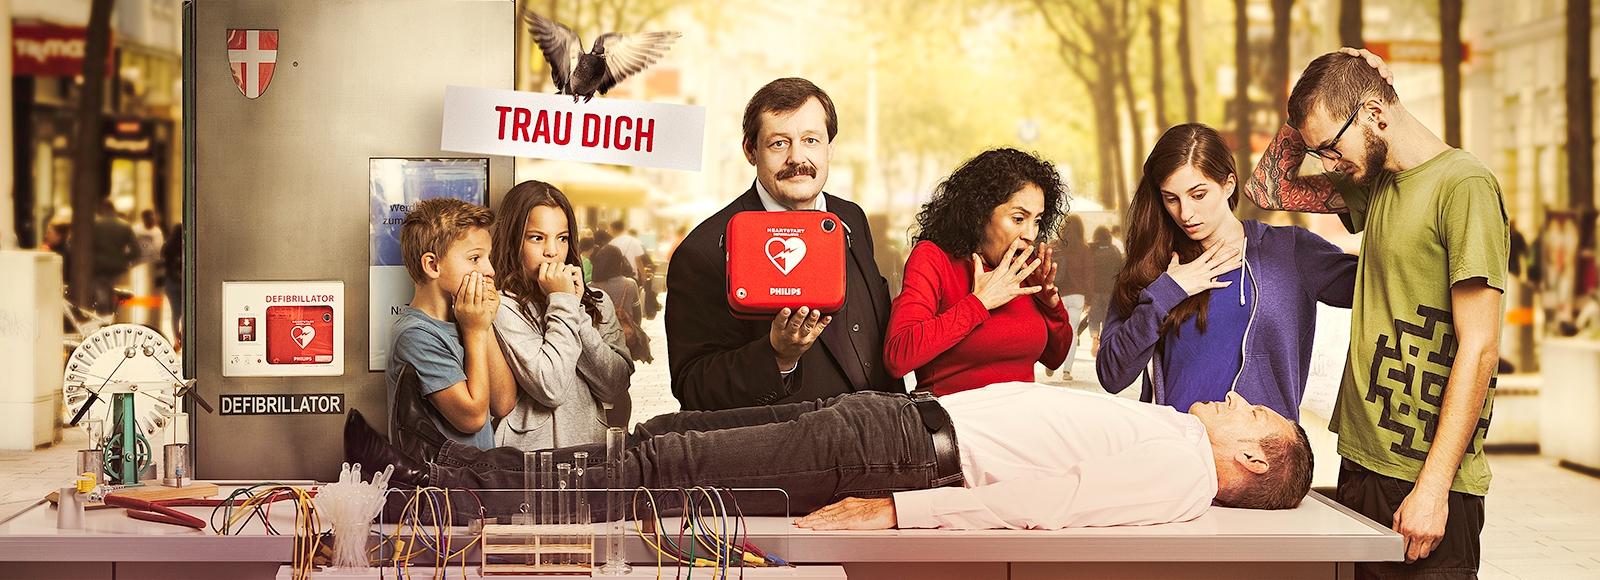 Banner Trau dich © www.ideenstricker.at